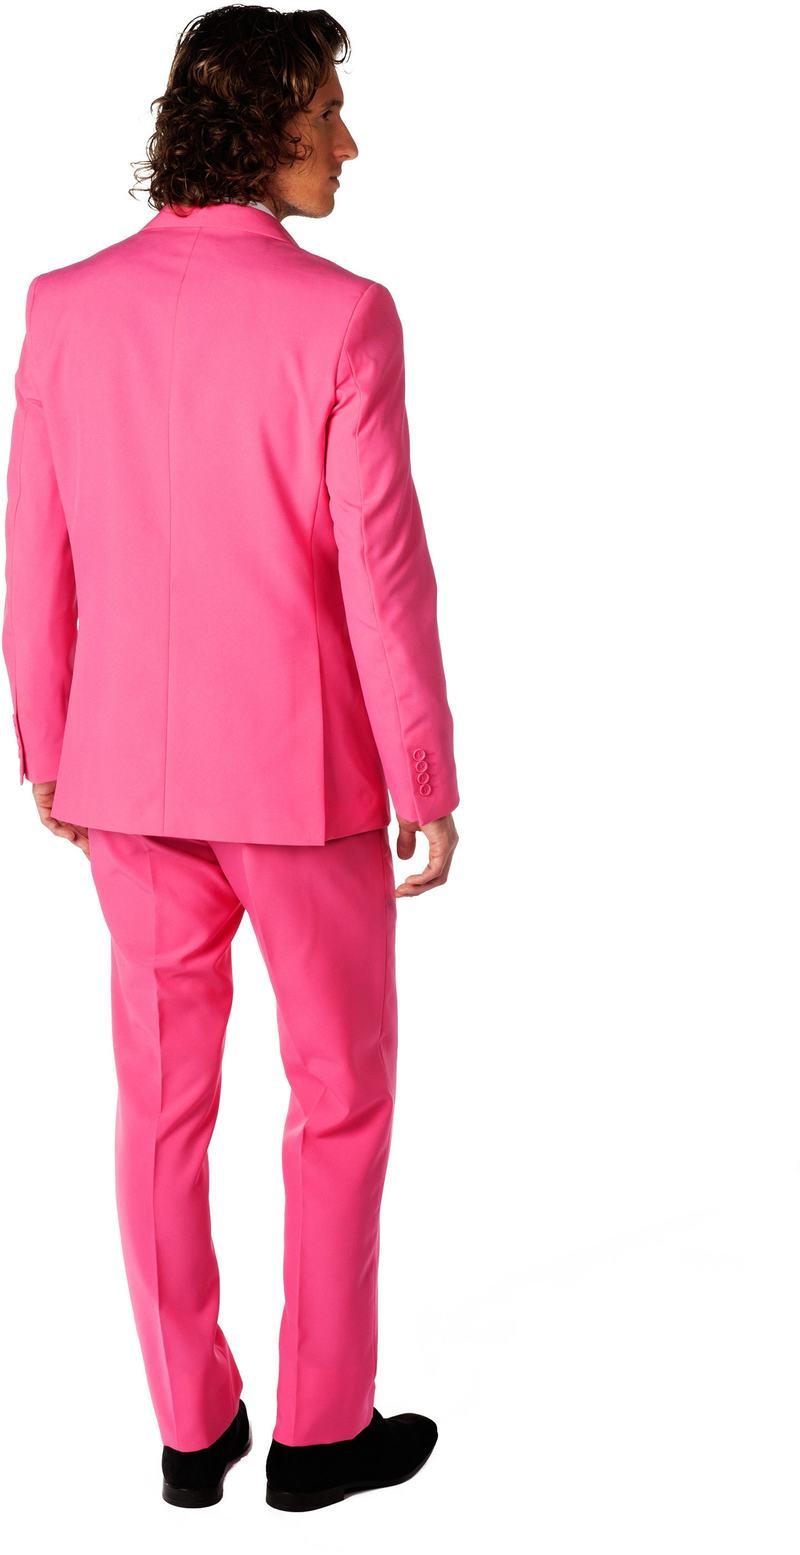 OppoSuits Mr Pink Kostuum foto 1